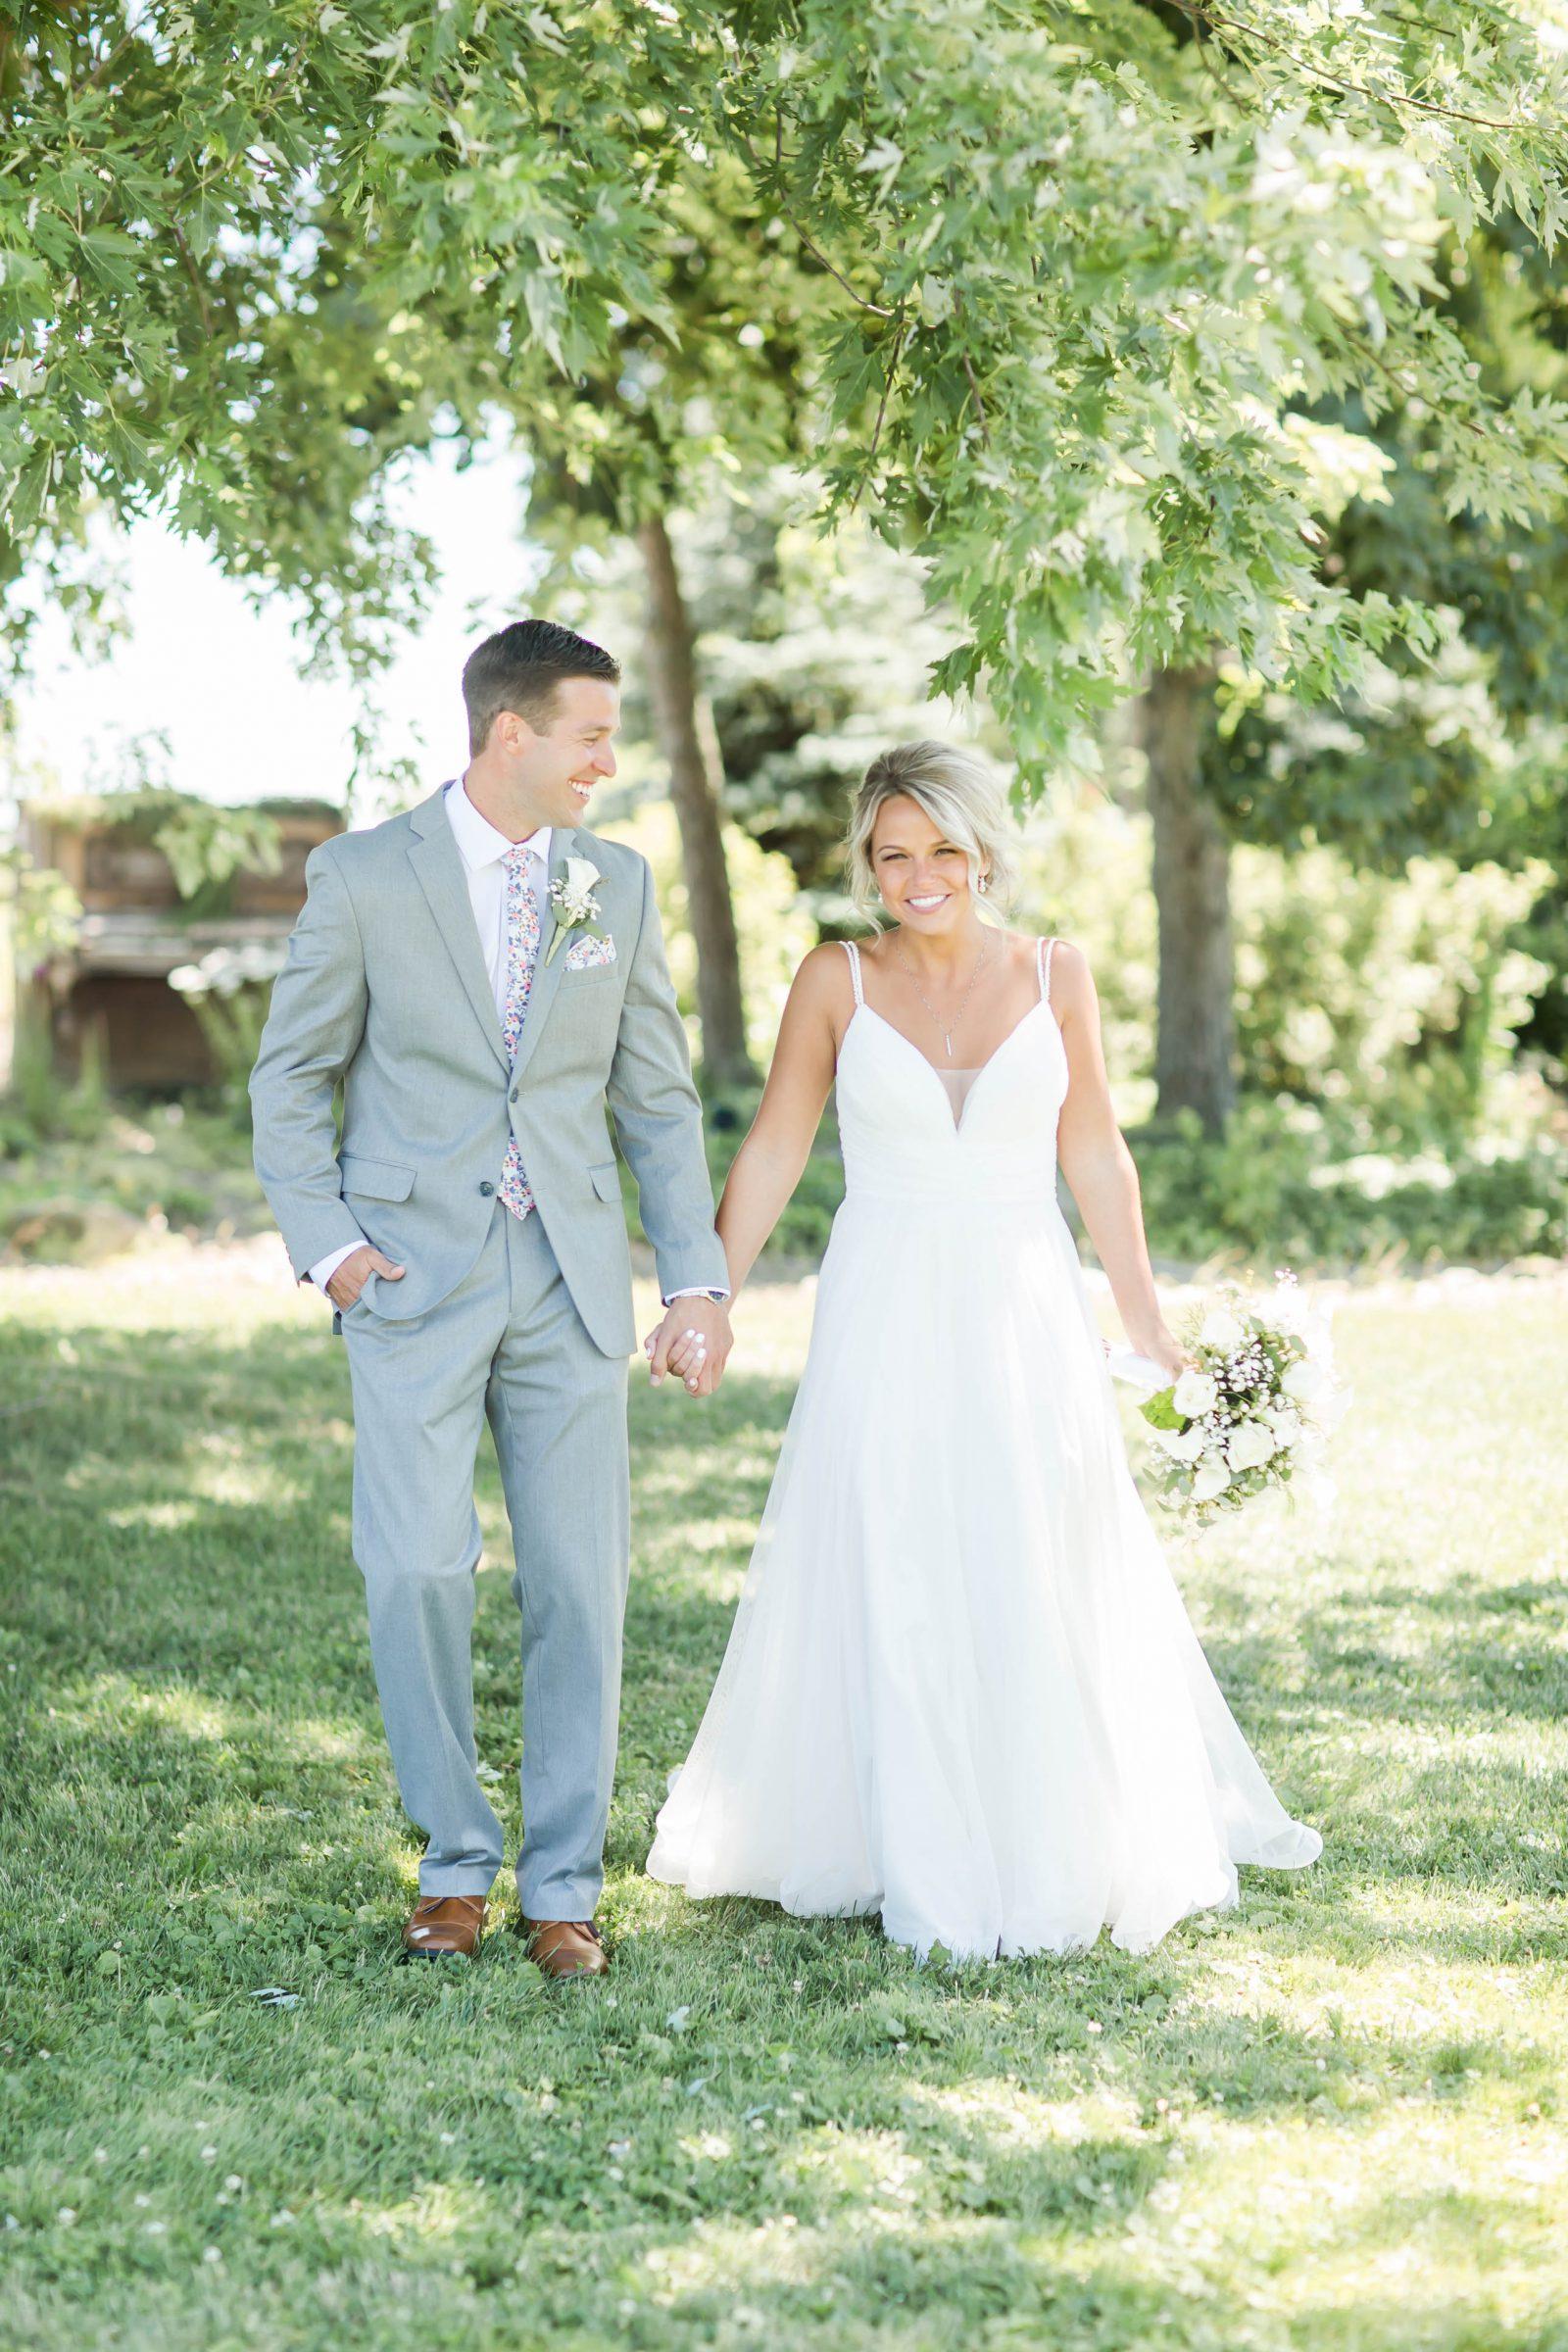 peacock-ridge-summer-wedding-photographer-akron-ohio-loren-jackson-photography-47